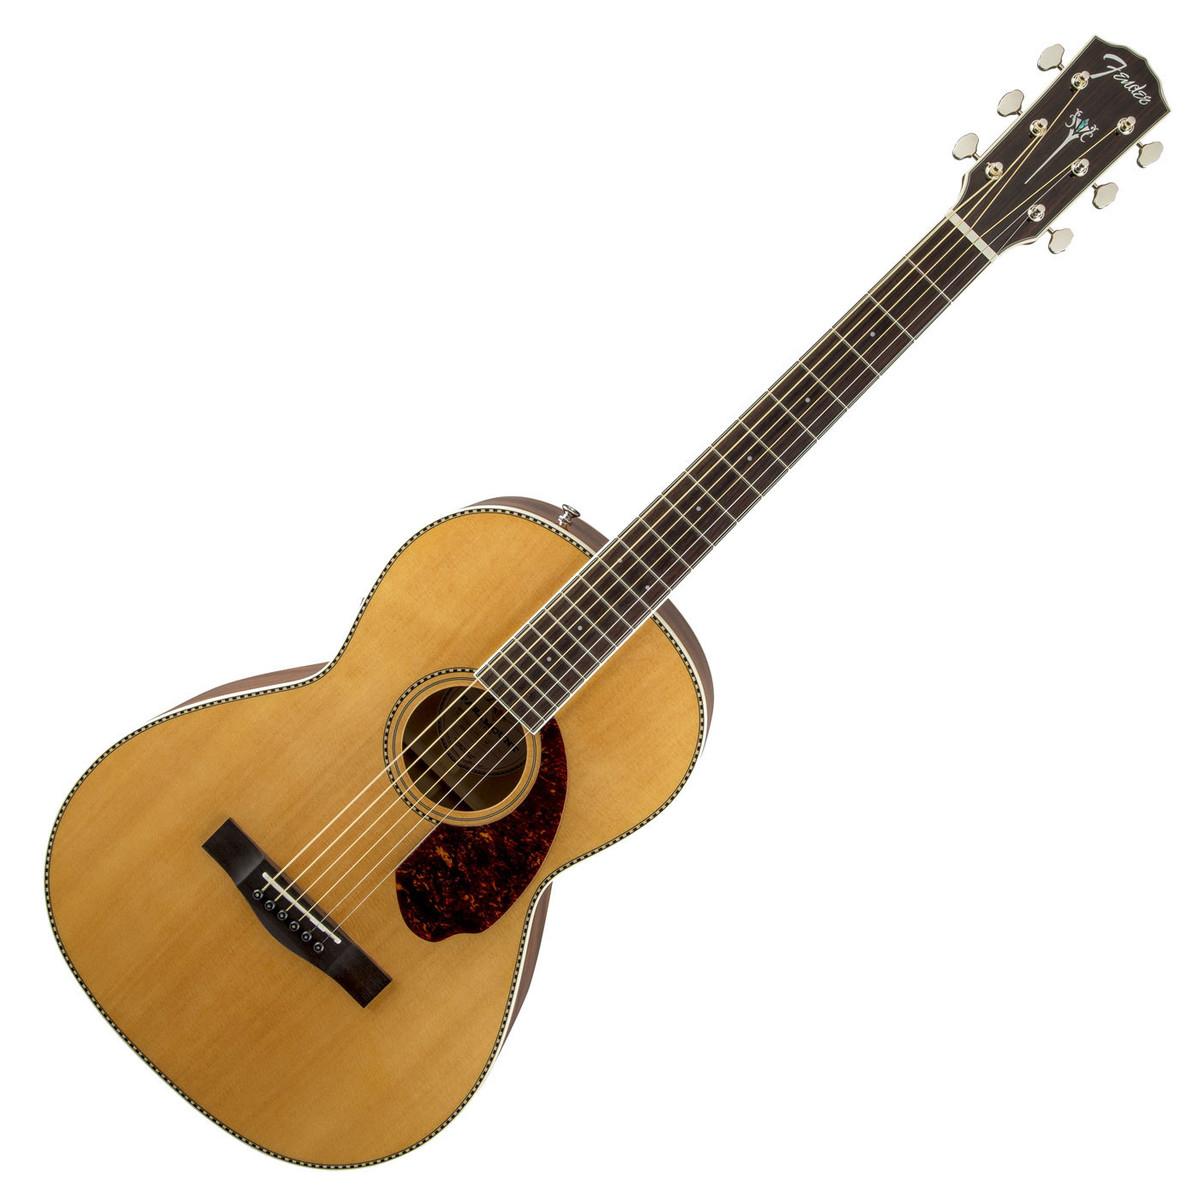 fender pm 2 standard parlour acoustic guitar natural at gear4music. Black Bedroom Furniture Sets. Home Design Ideas